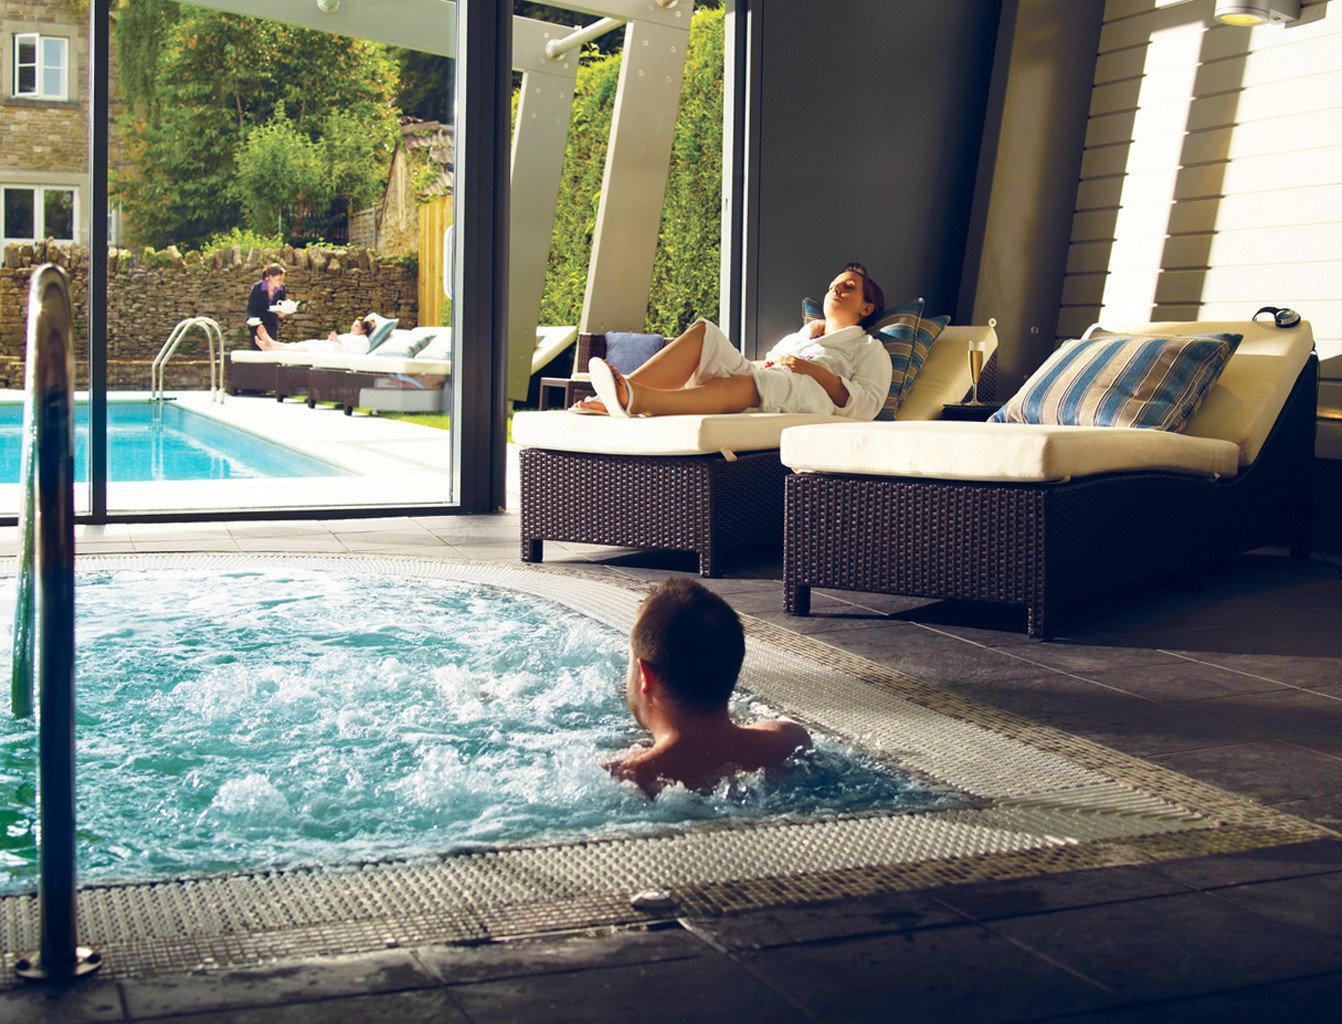 leisure swimming pool backyard